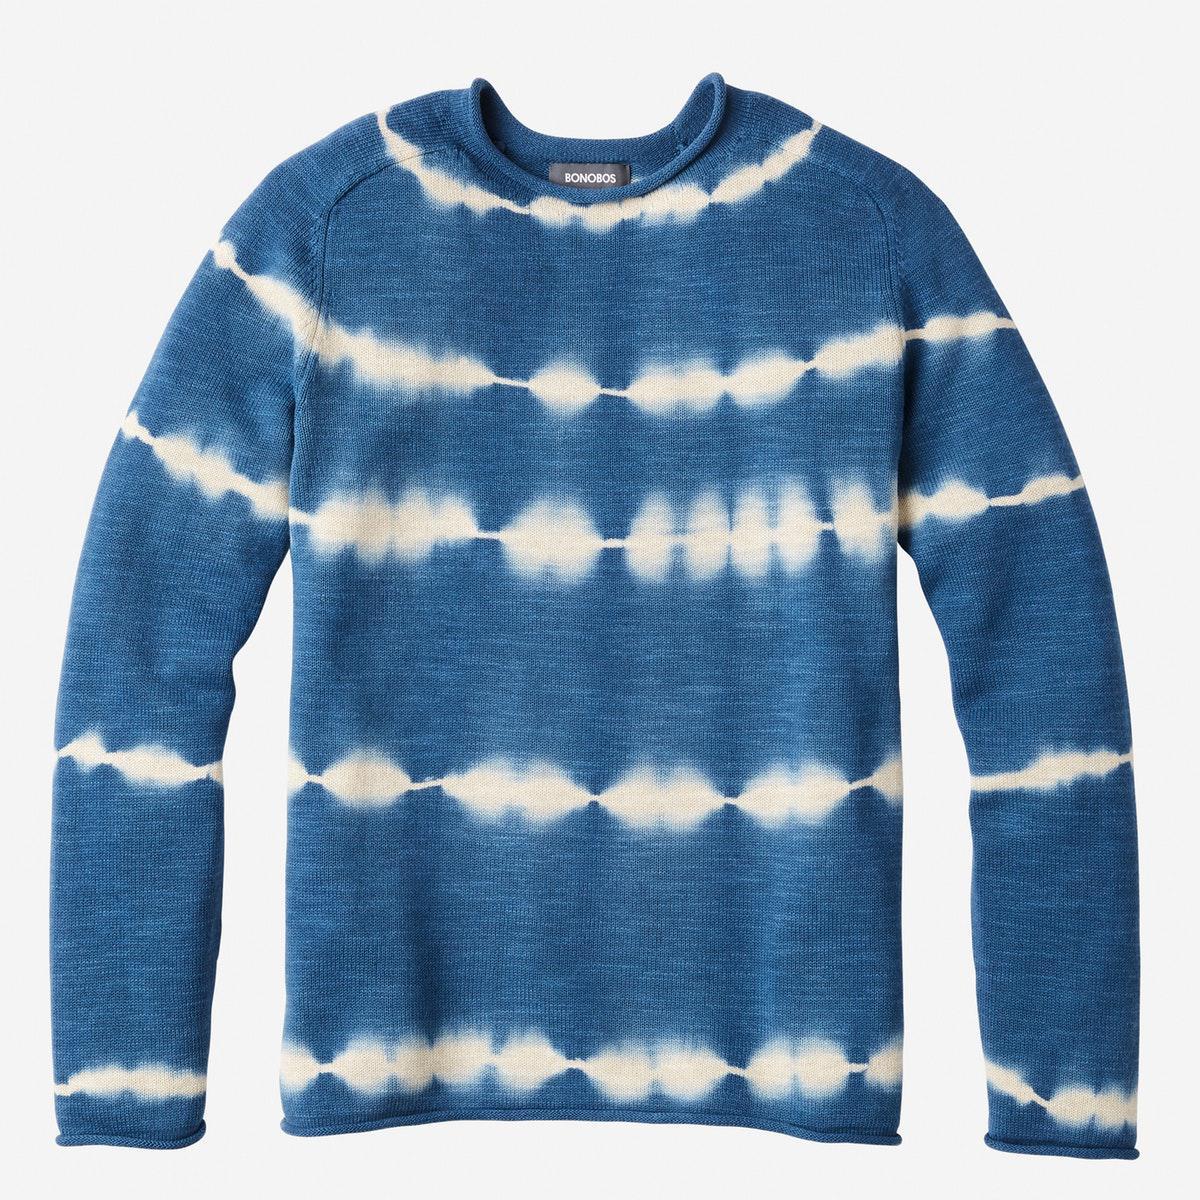 28819b85c609 Lyst - Bonobos Cotton Linen Roll Neck Sweater in Blue for Men